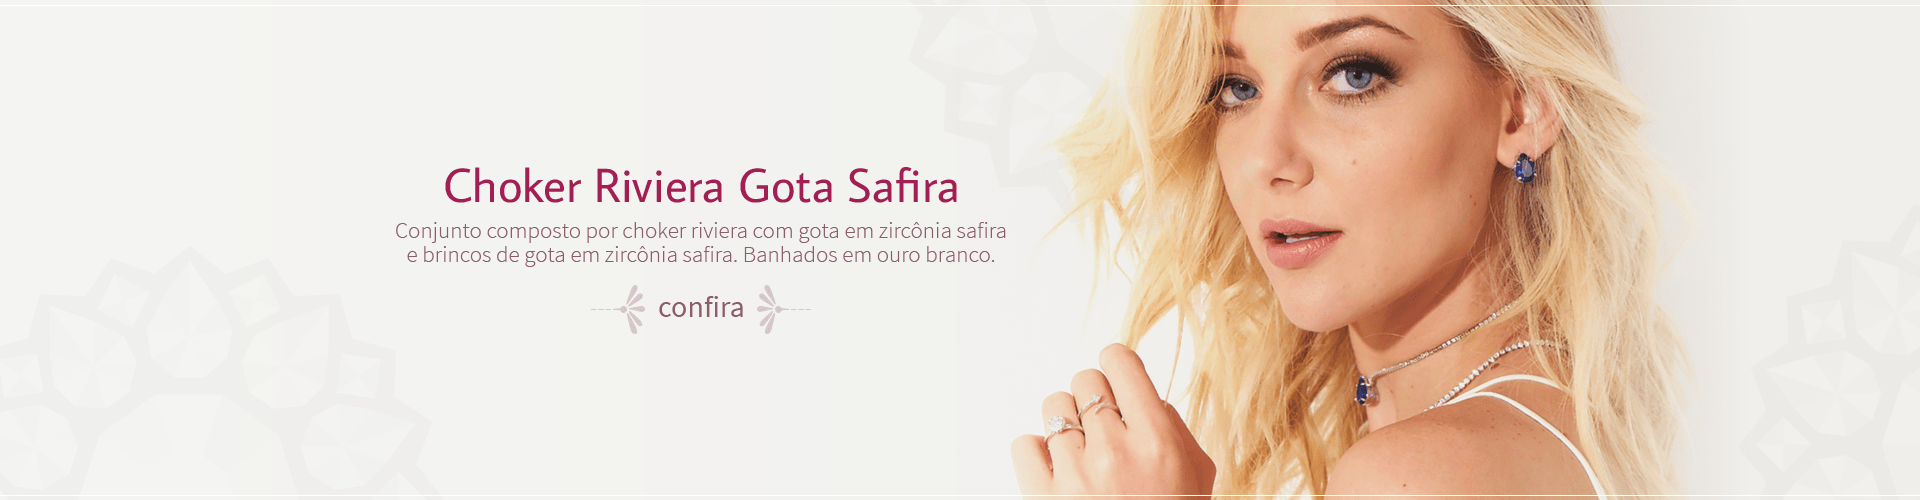 Choker Riviera Gota Safira